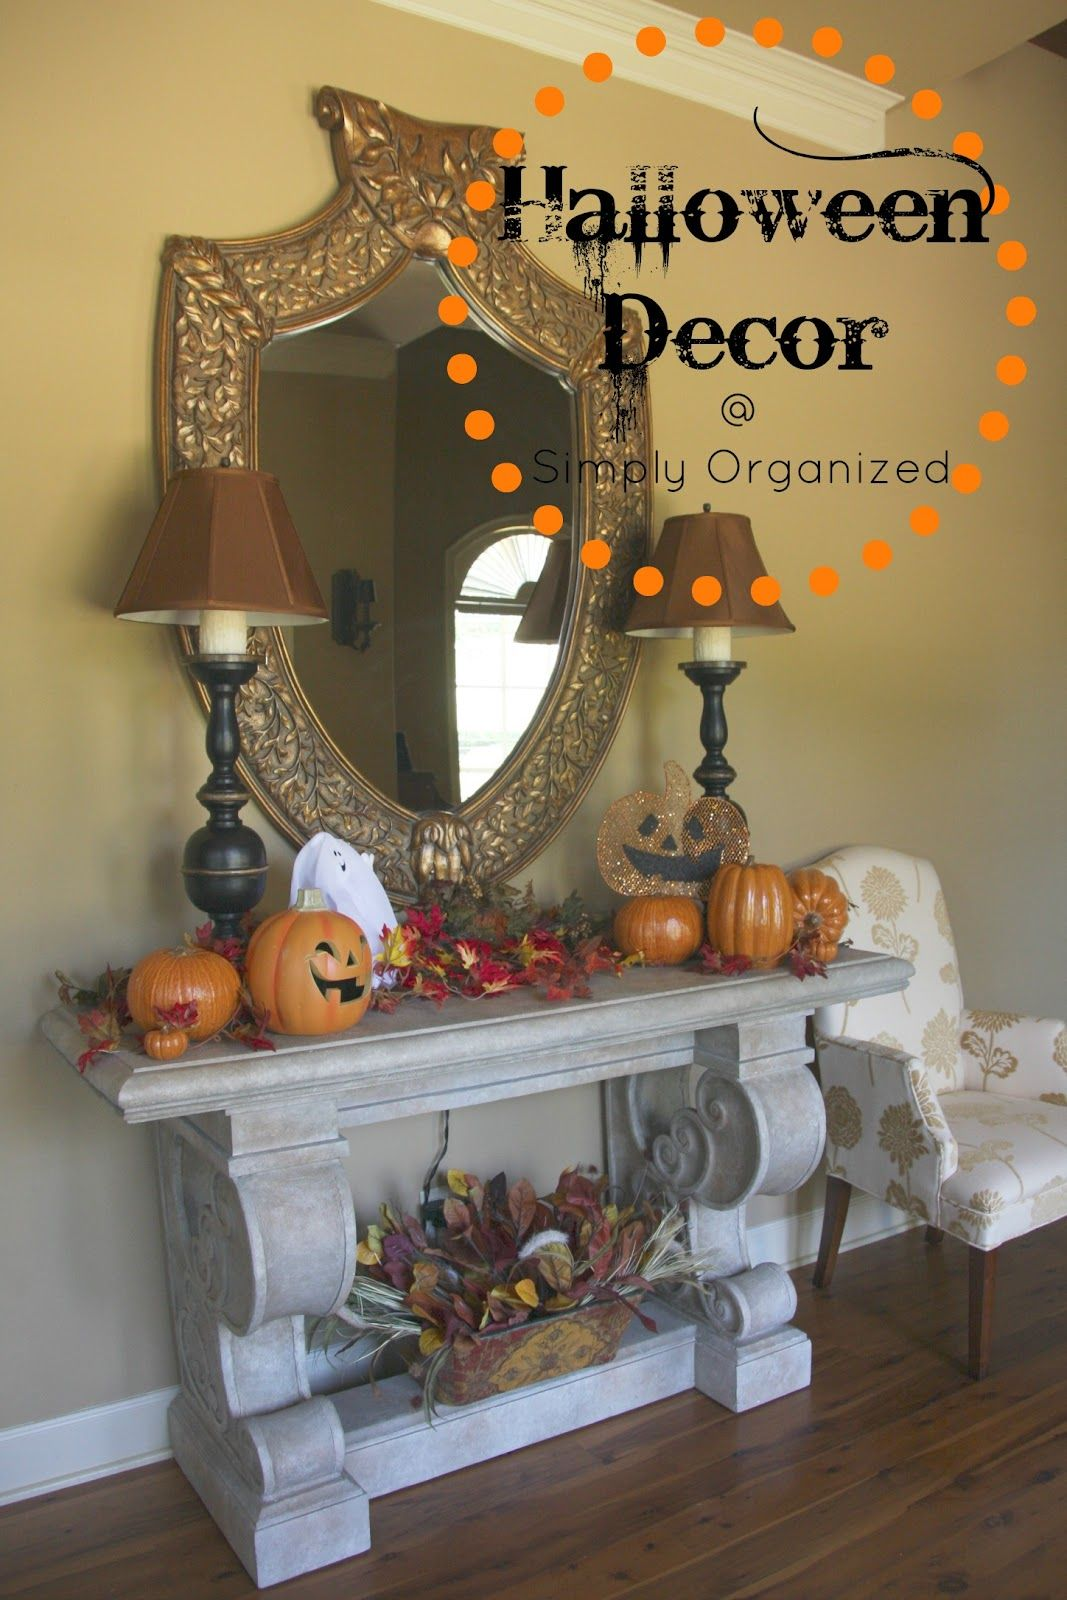 simply organized: halloween decor - inside home tour   fall decor